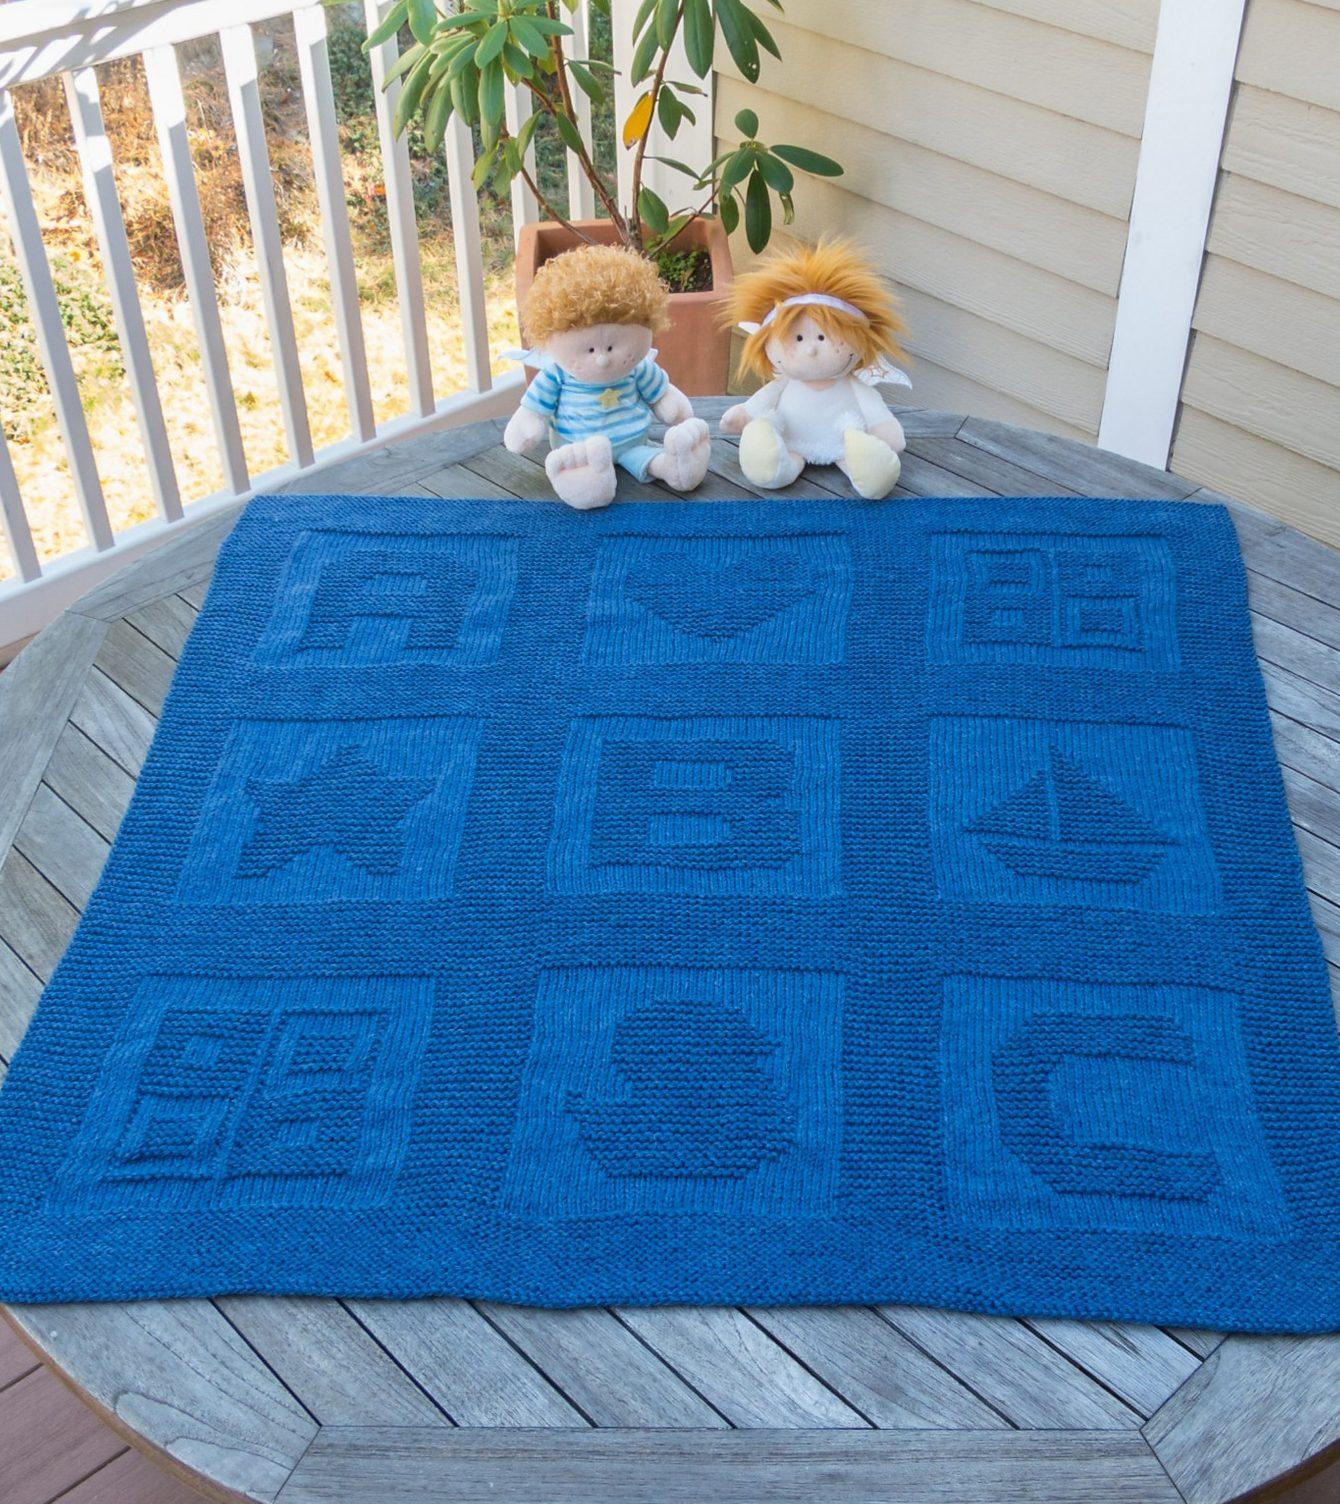 The Beautiful Free Baby Blanket Knitting Patterns